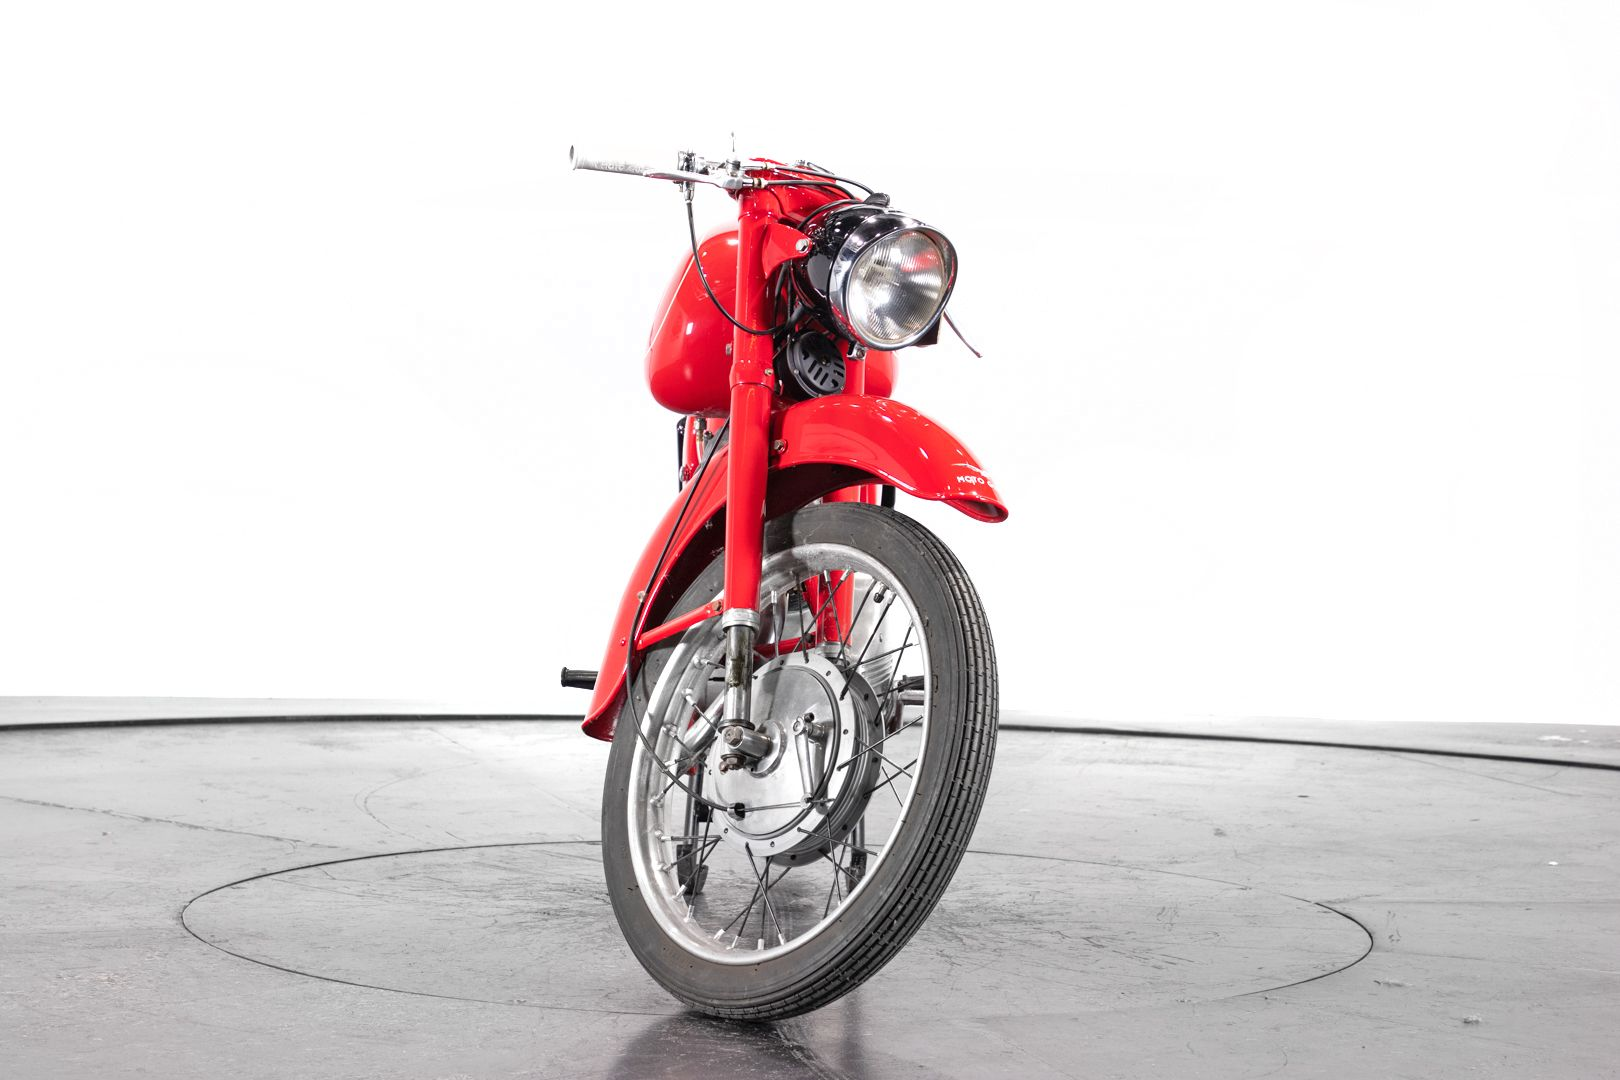 1959 Moto Guzzi Lodola 235 GT 41880